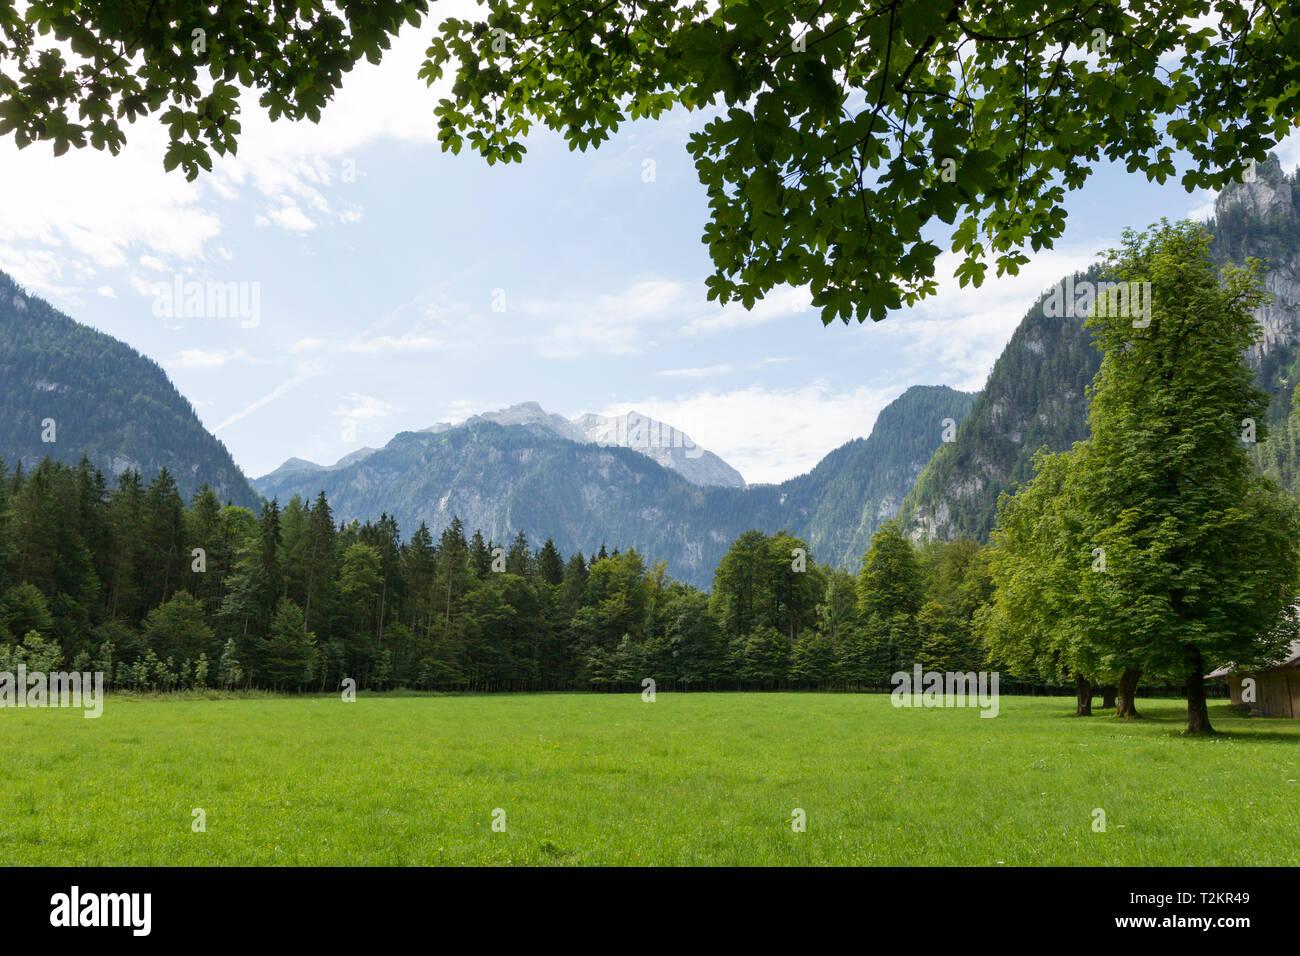 Koenigssee - Stock Image